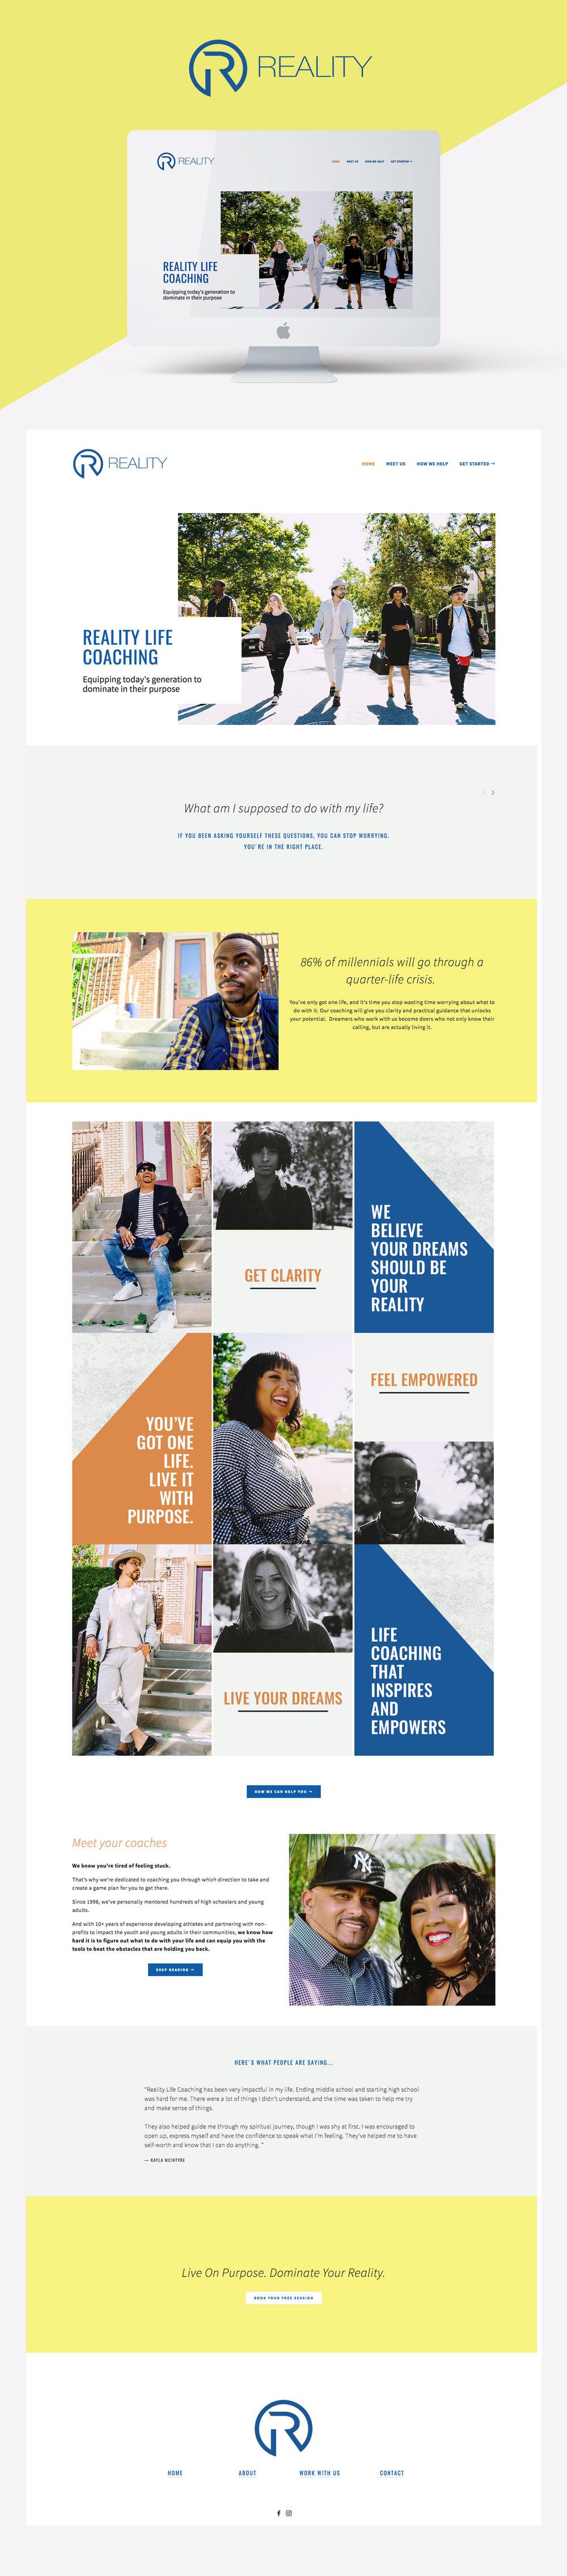 beyond-the-blvd-design-custom-website-reality-life-coaching.jpg